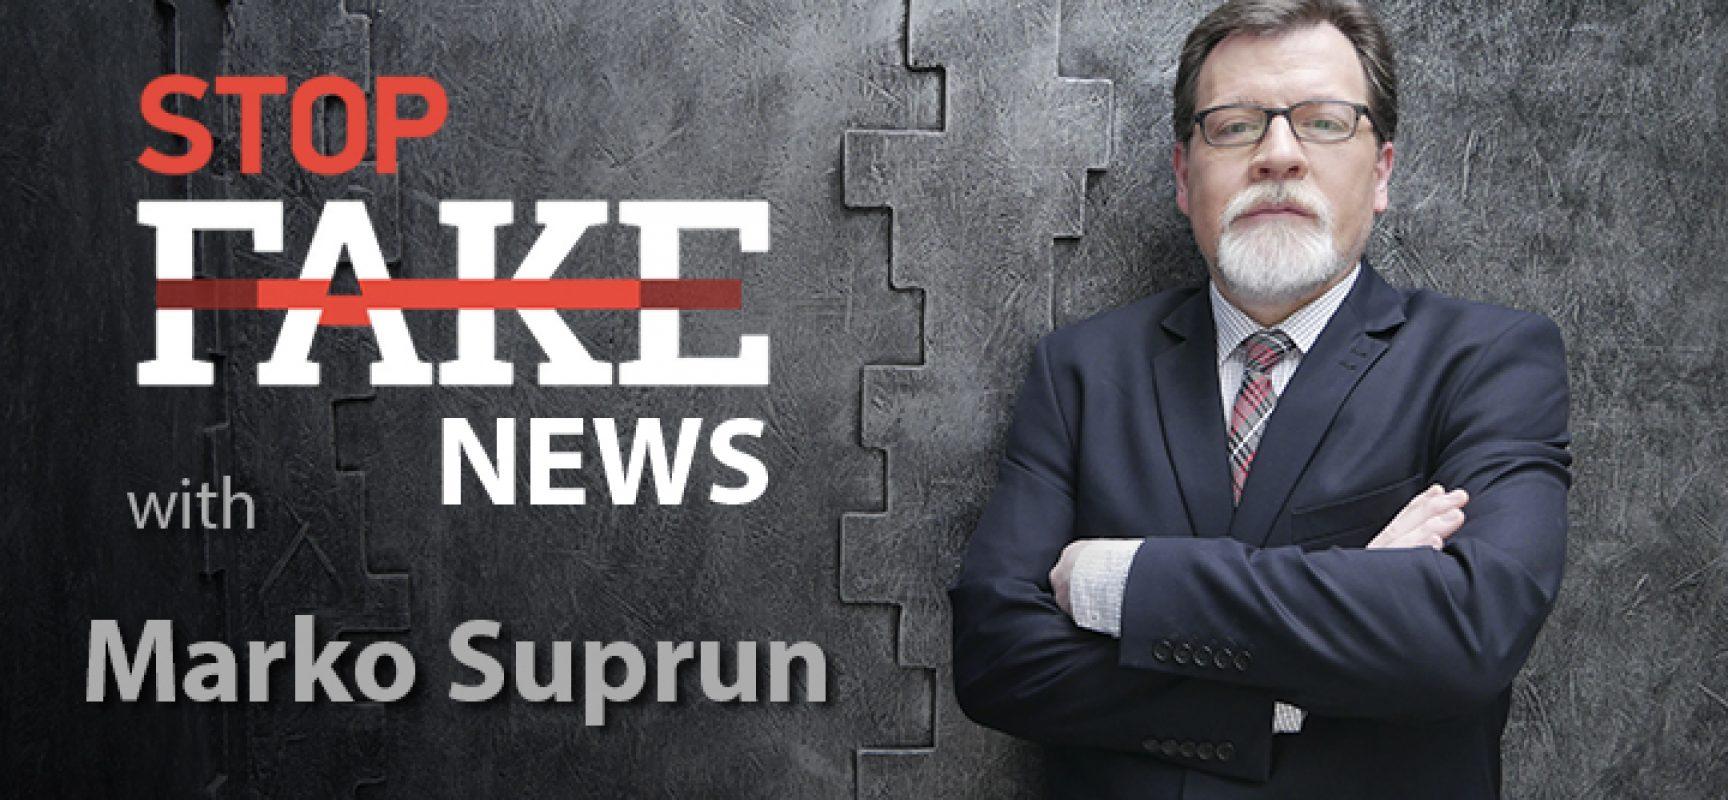 StopFakeNews #133 [ENG] con Marko Suprun